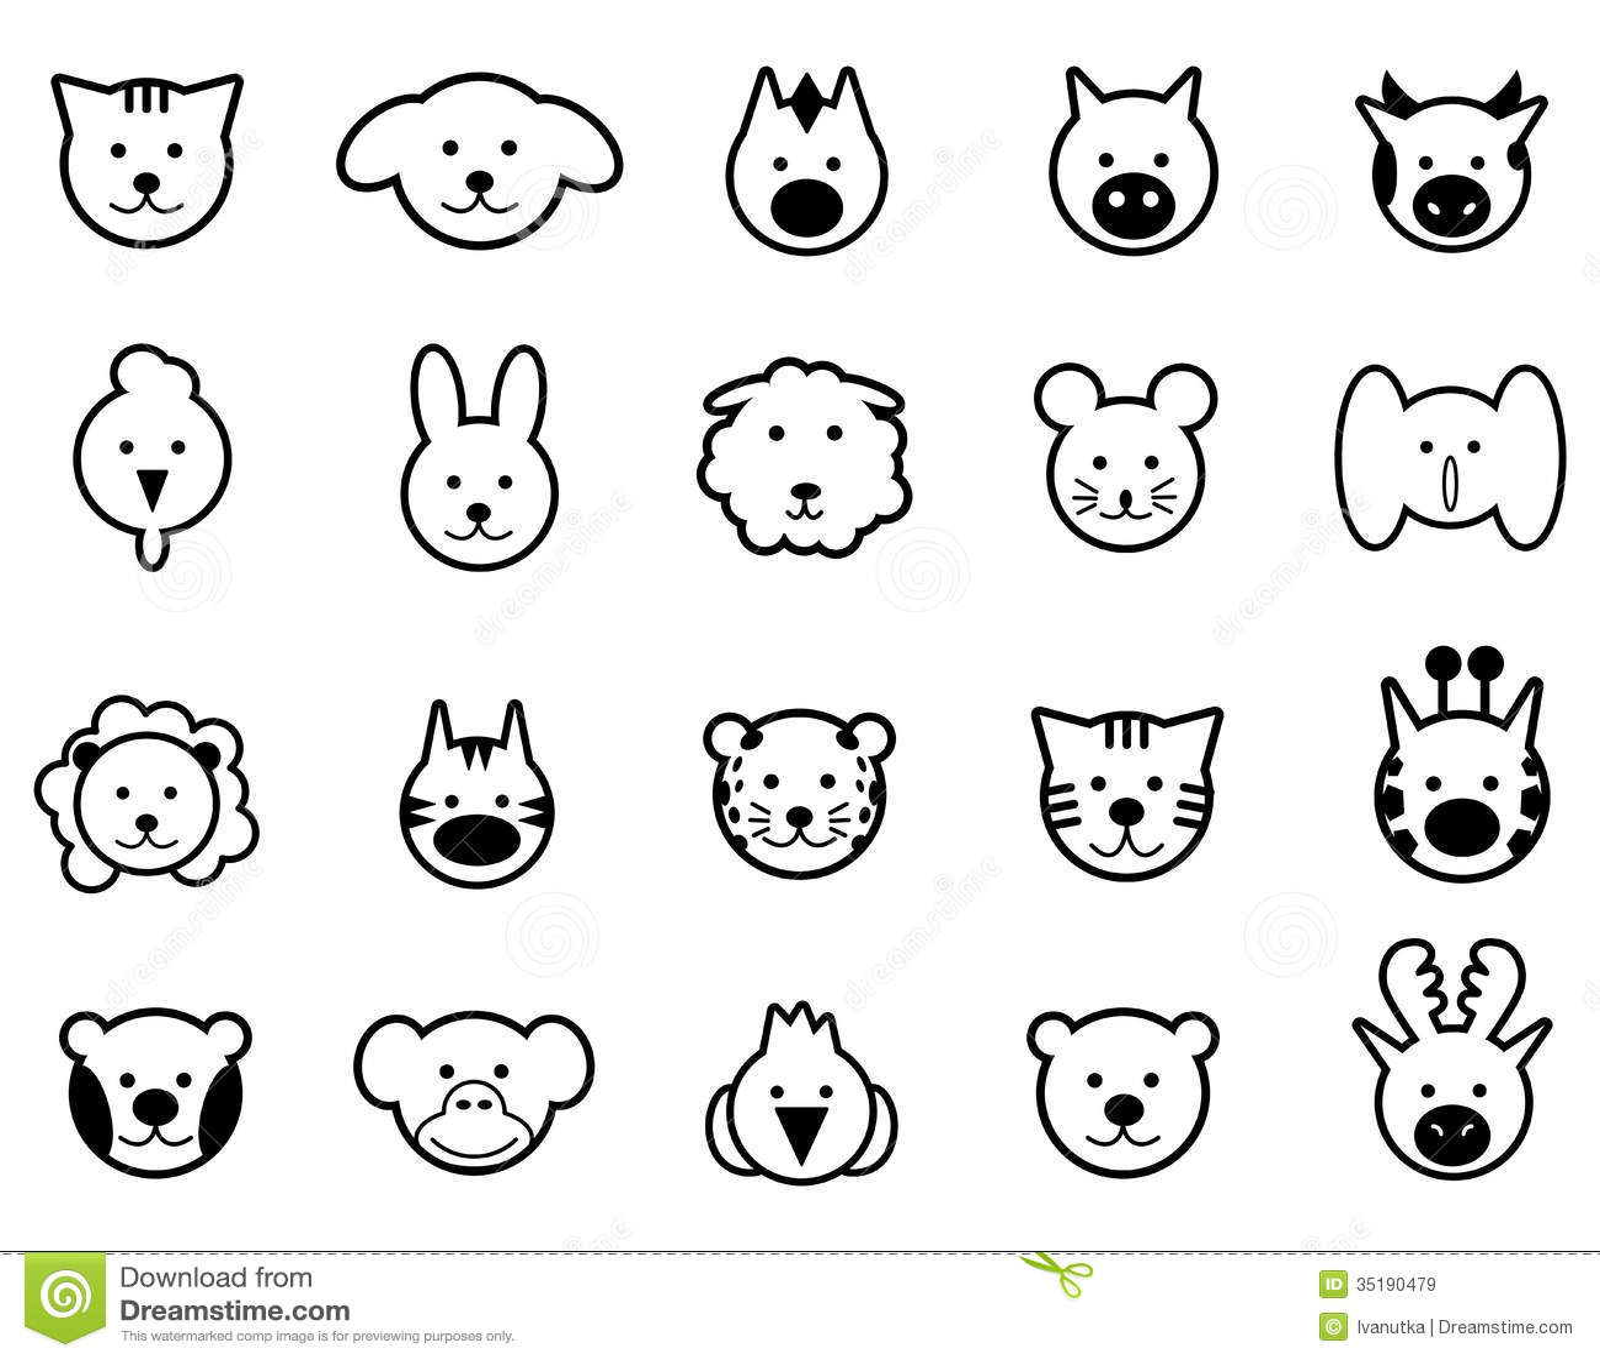 Animals Black Icons Stock Vector Illustration Of Sheep